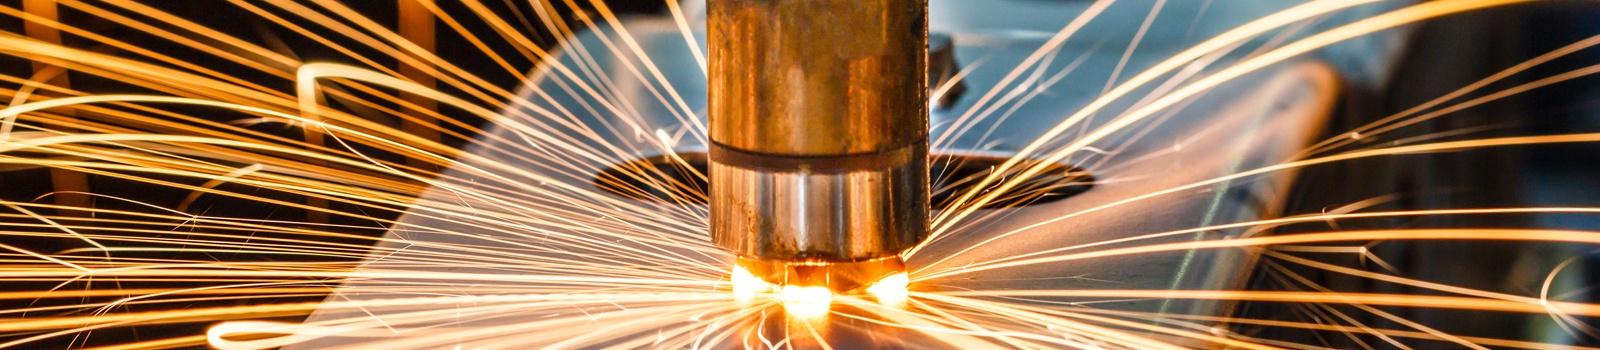 Fabrication Equipment Financing